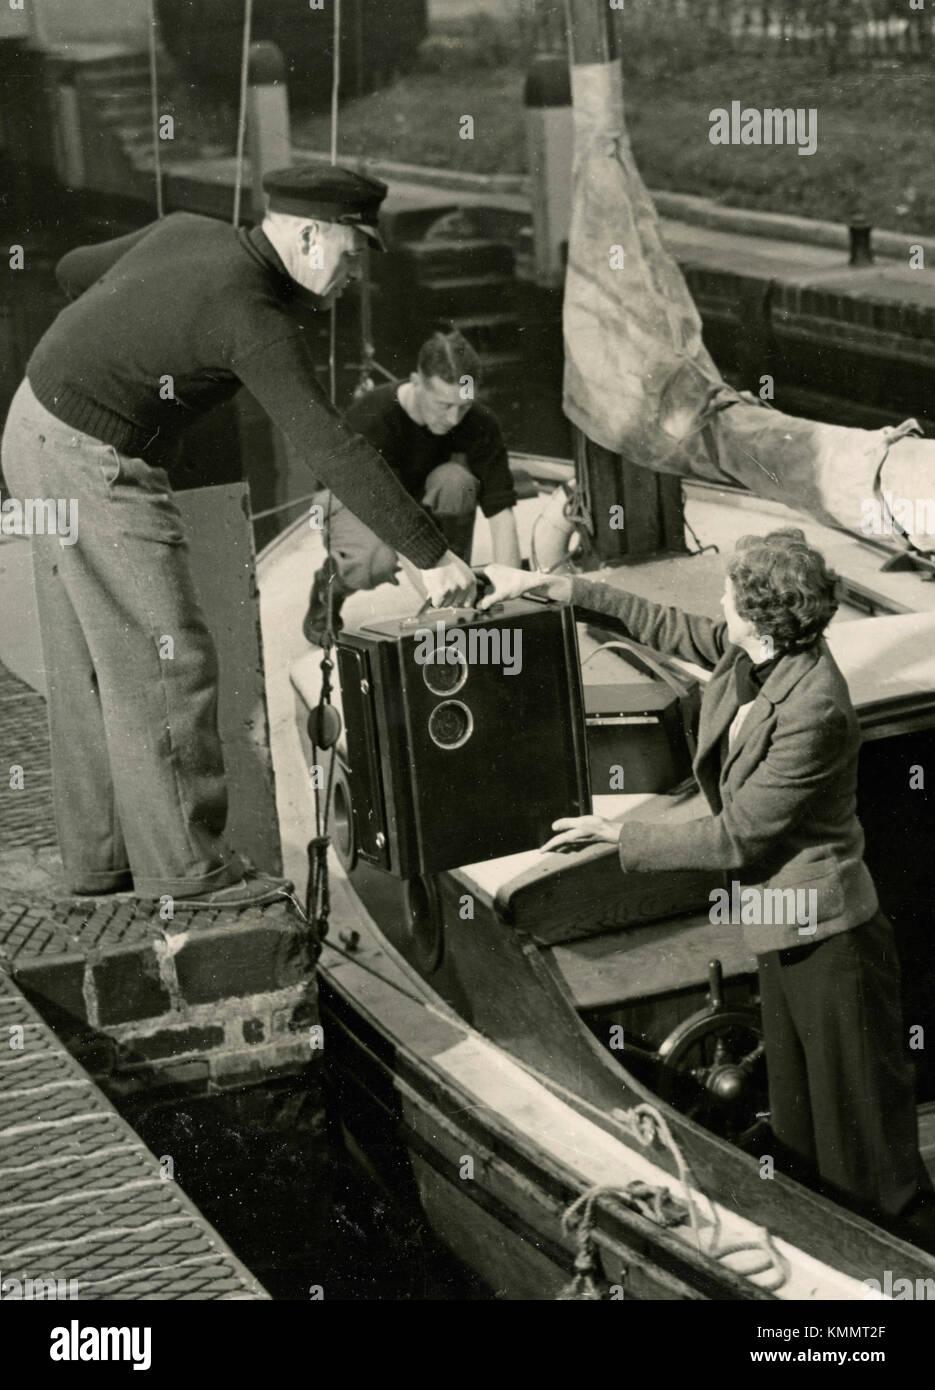 Amateur yachtsman embarking battery driven portable navigator, UK 1950s - Stock Image